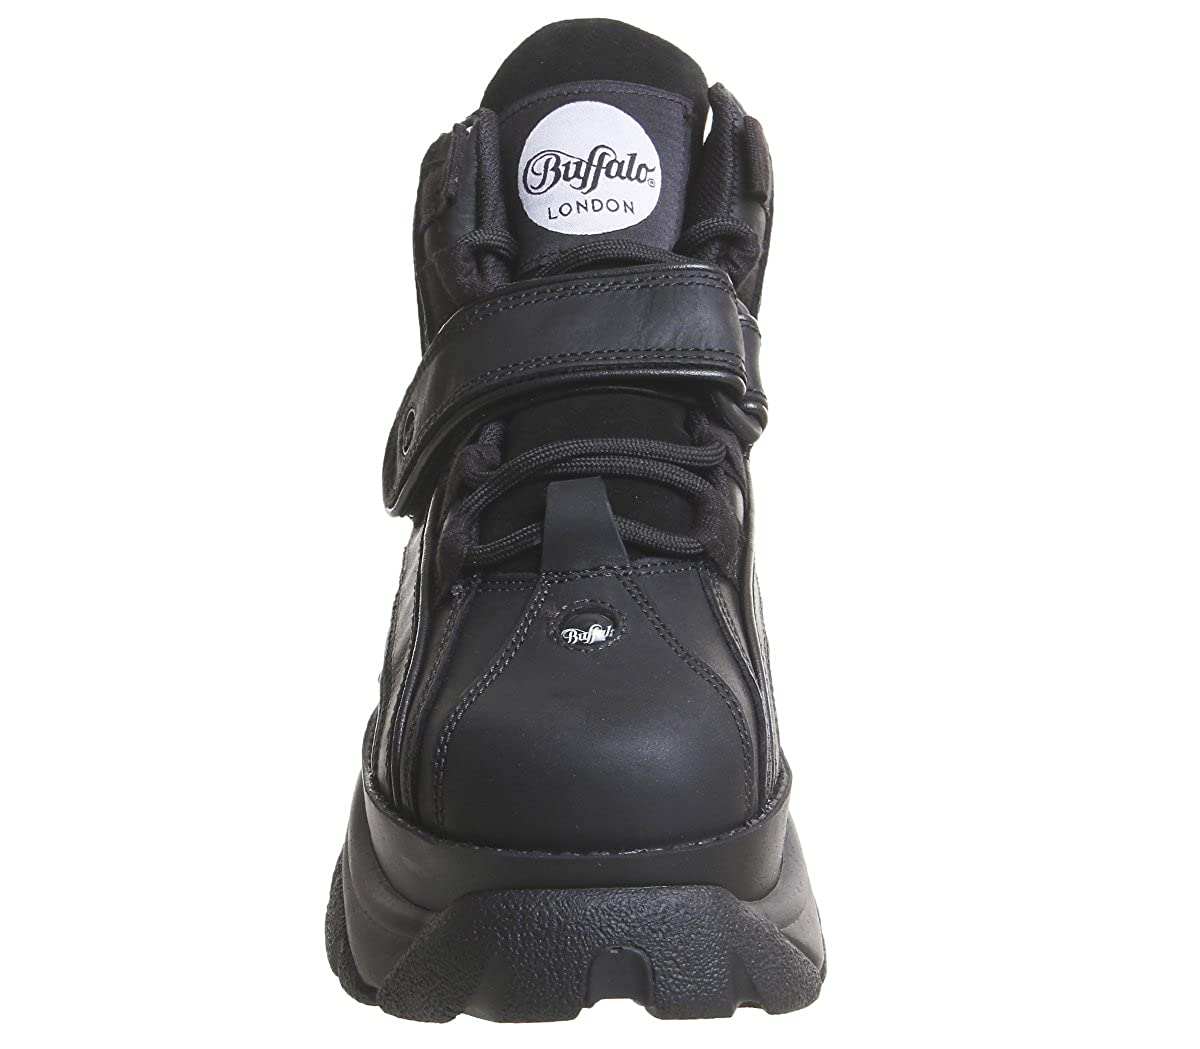 0a8c1871d0ced Buffalo Womens Classics 2.0 Texas Oil Leather Boots